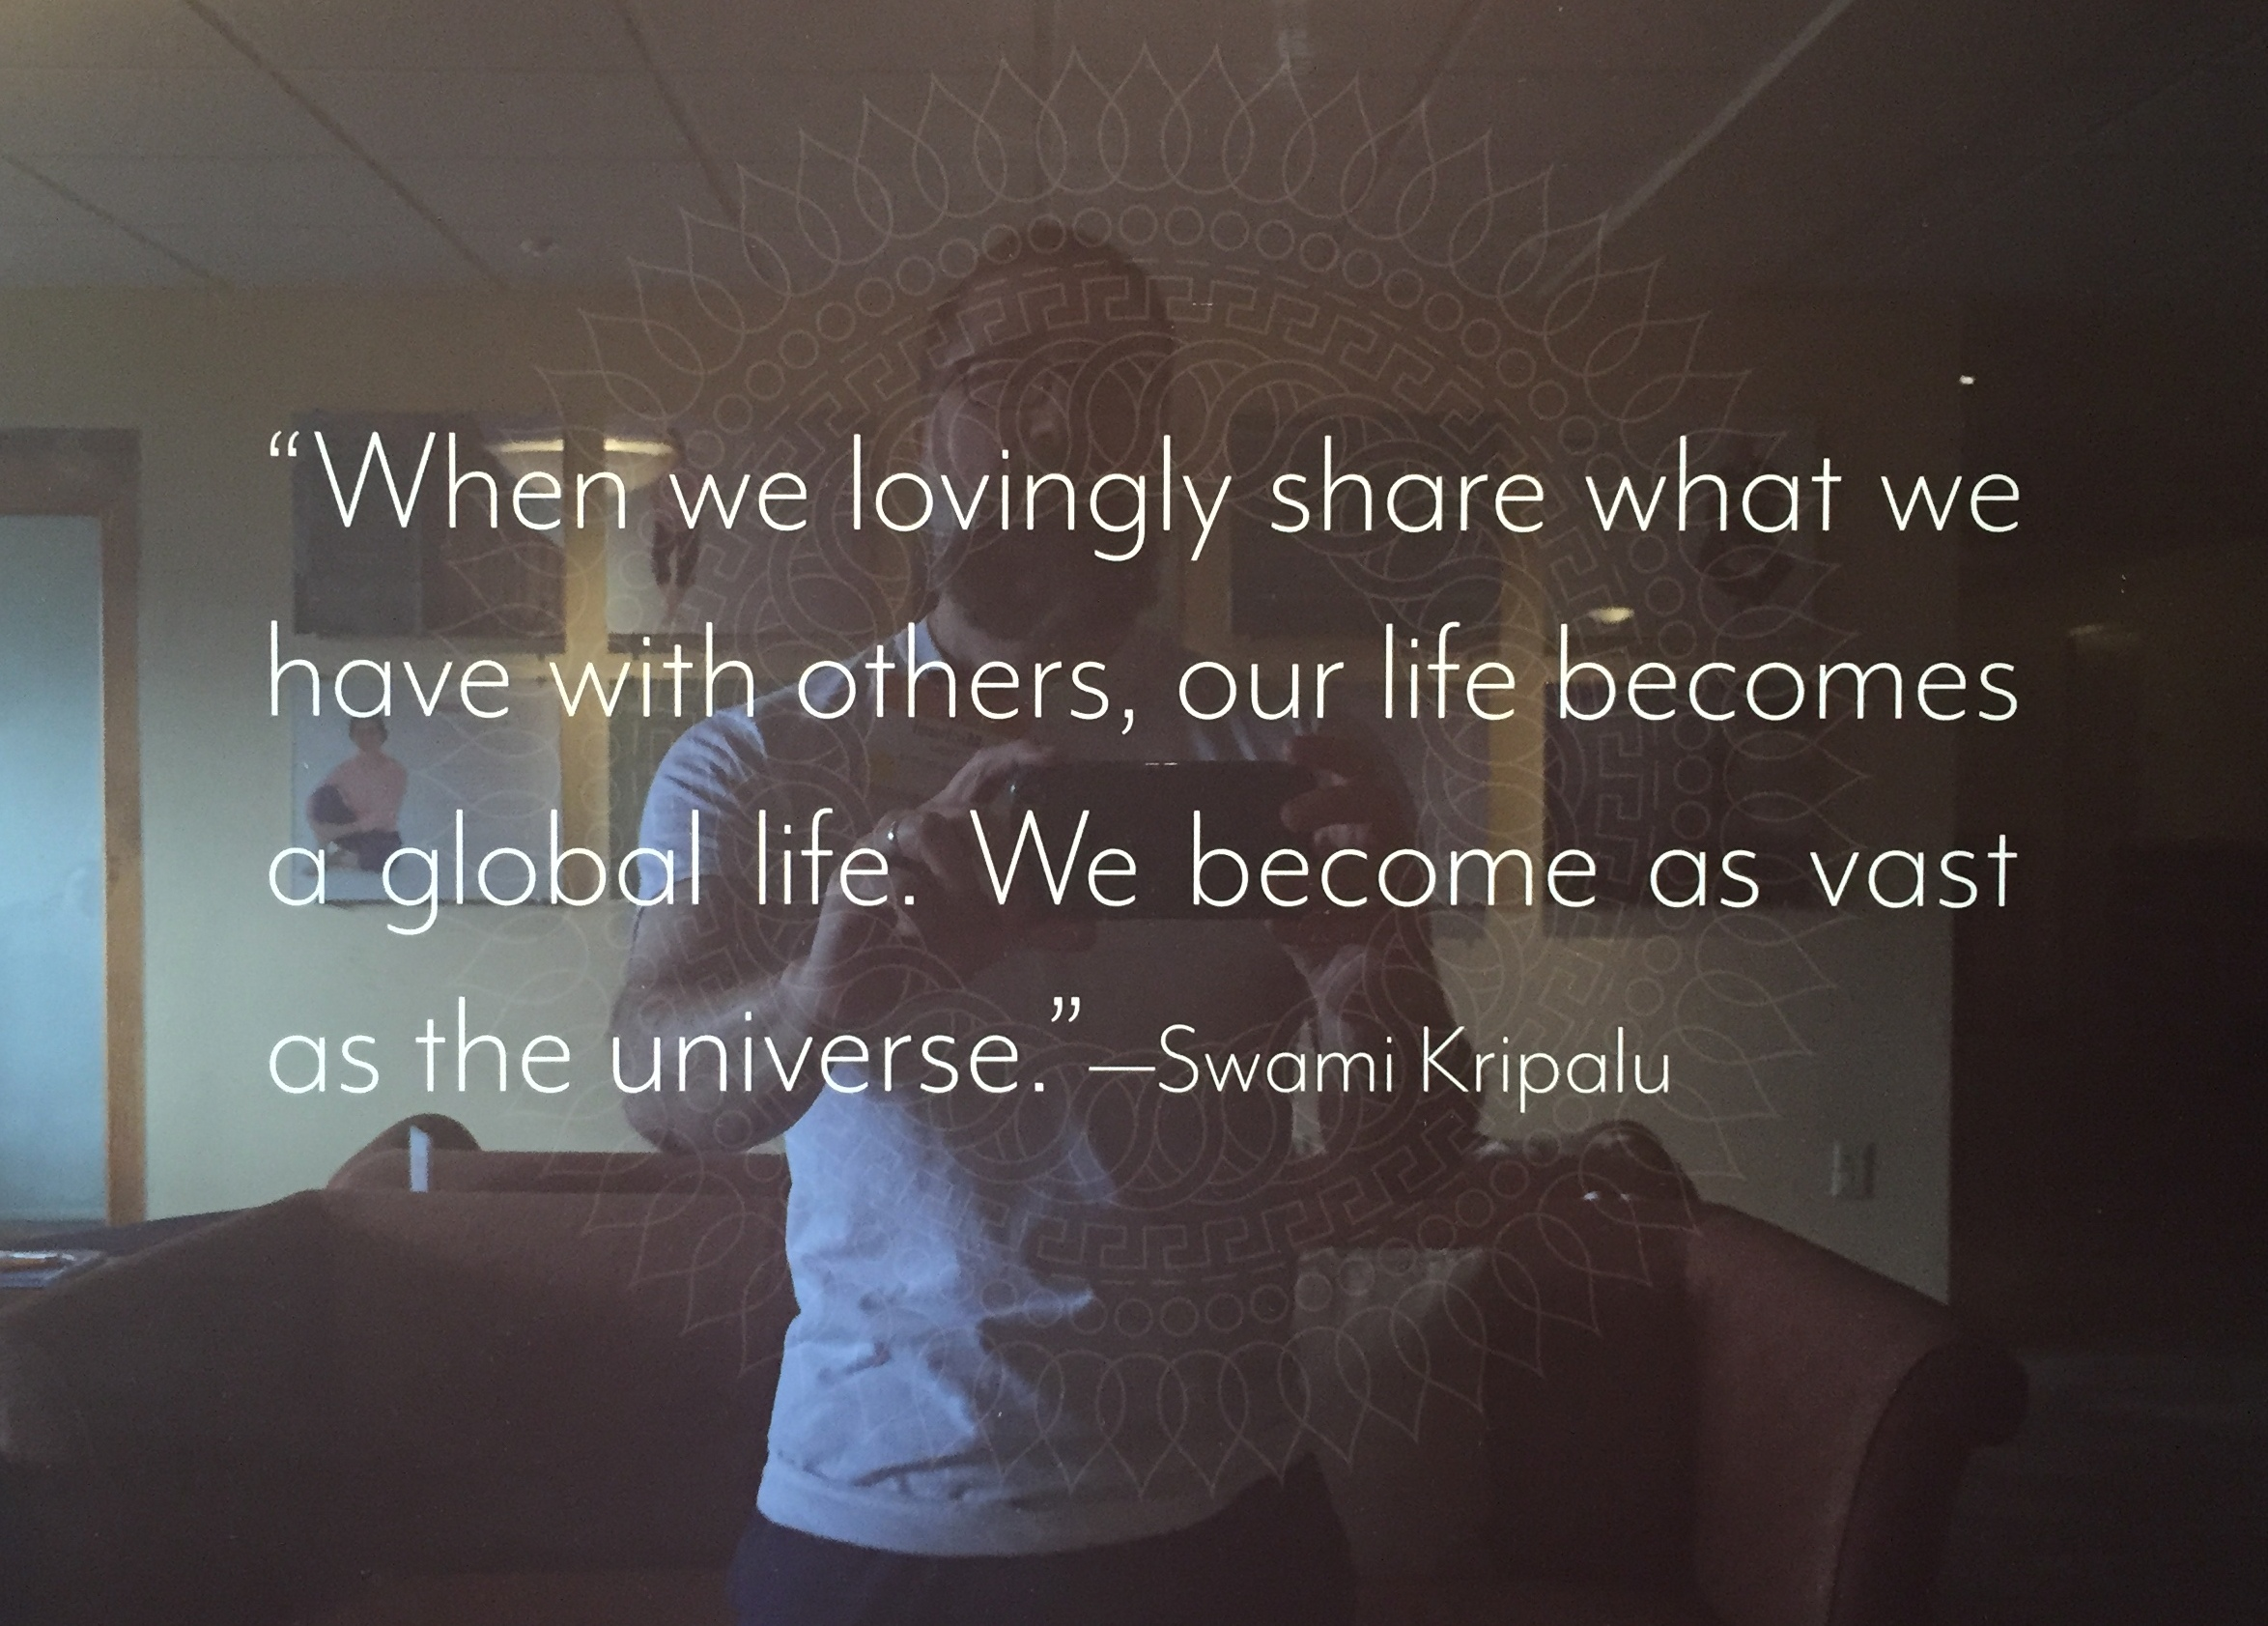 michael-patrick-reflected-in-swami-kripalu-quote.JPG